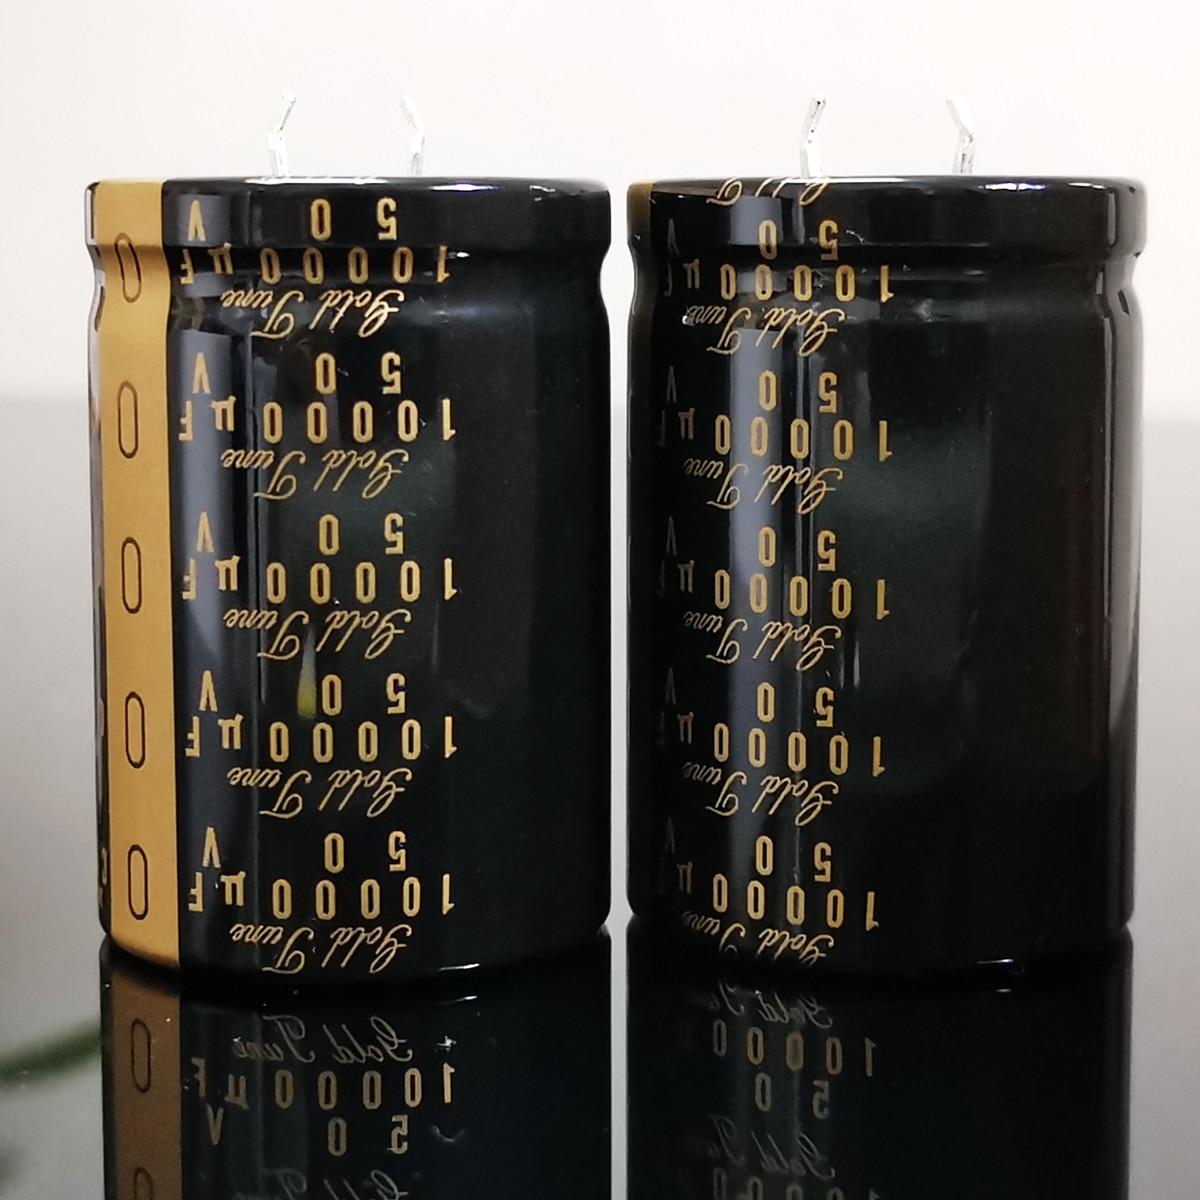 2pcs/lot Original Japanese Nichicon KG TYPE series fever capacitor audio electrolytic capacitor free shipping